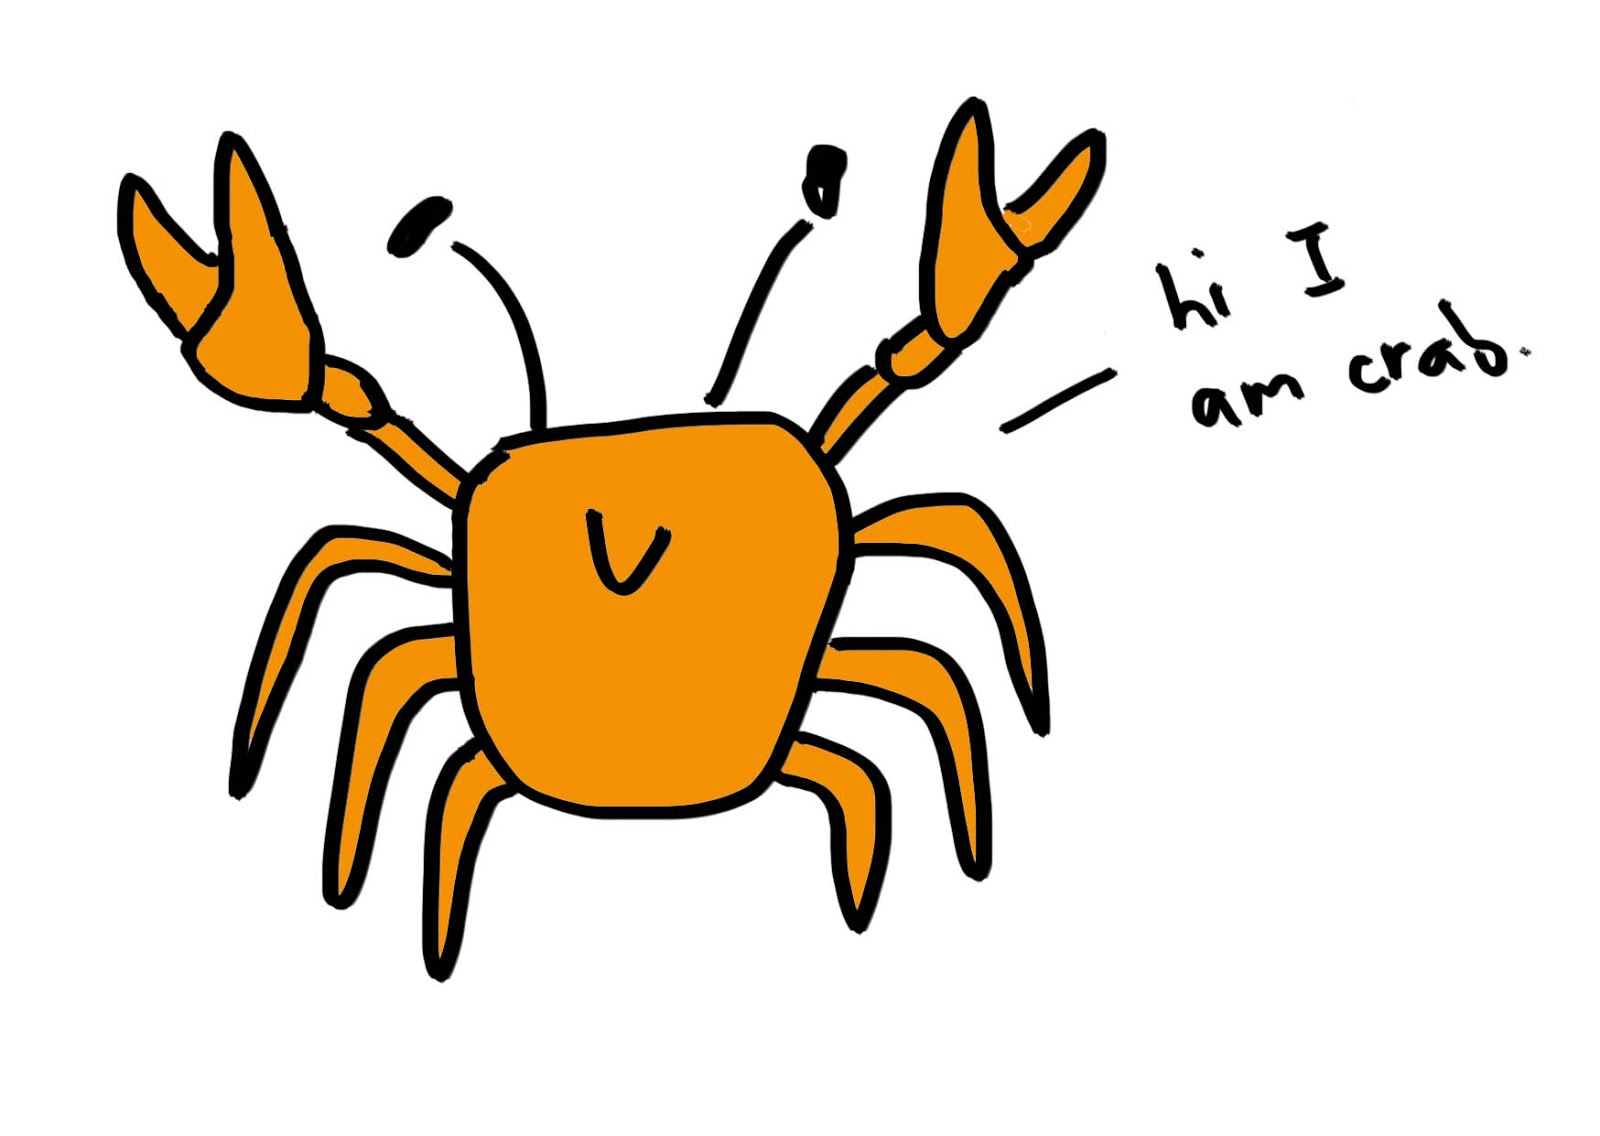 Crab emoji clipart png library ifonlywefartflowers: April 2015 png library